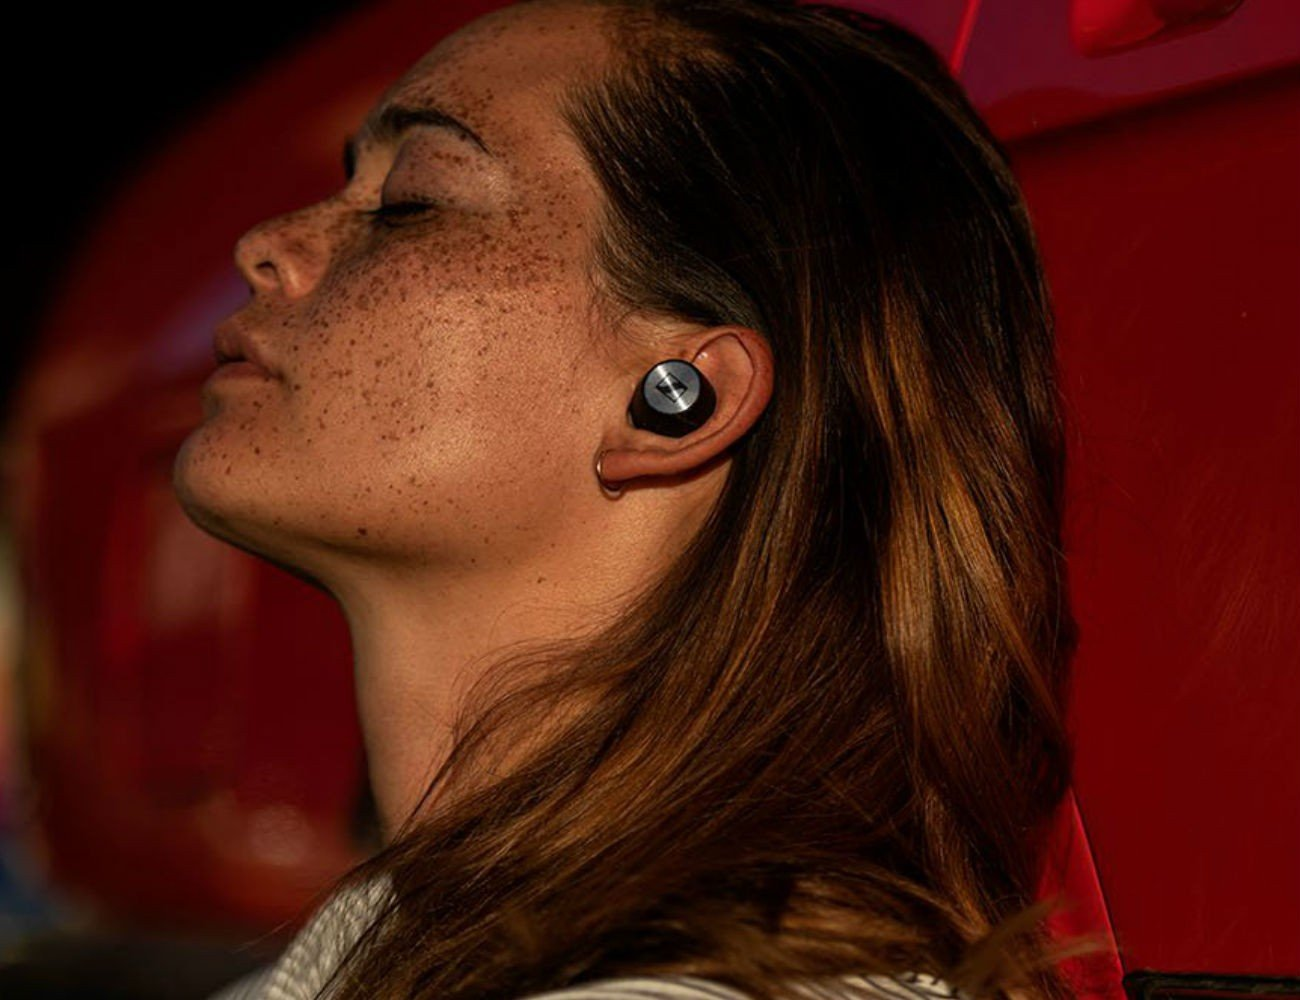 Sennheiser-MOMENTUM-True-Wireless-Earbuds-07.jpg